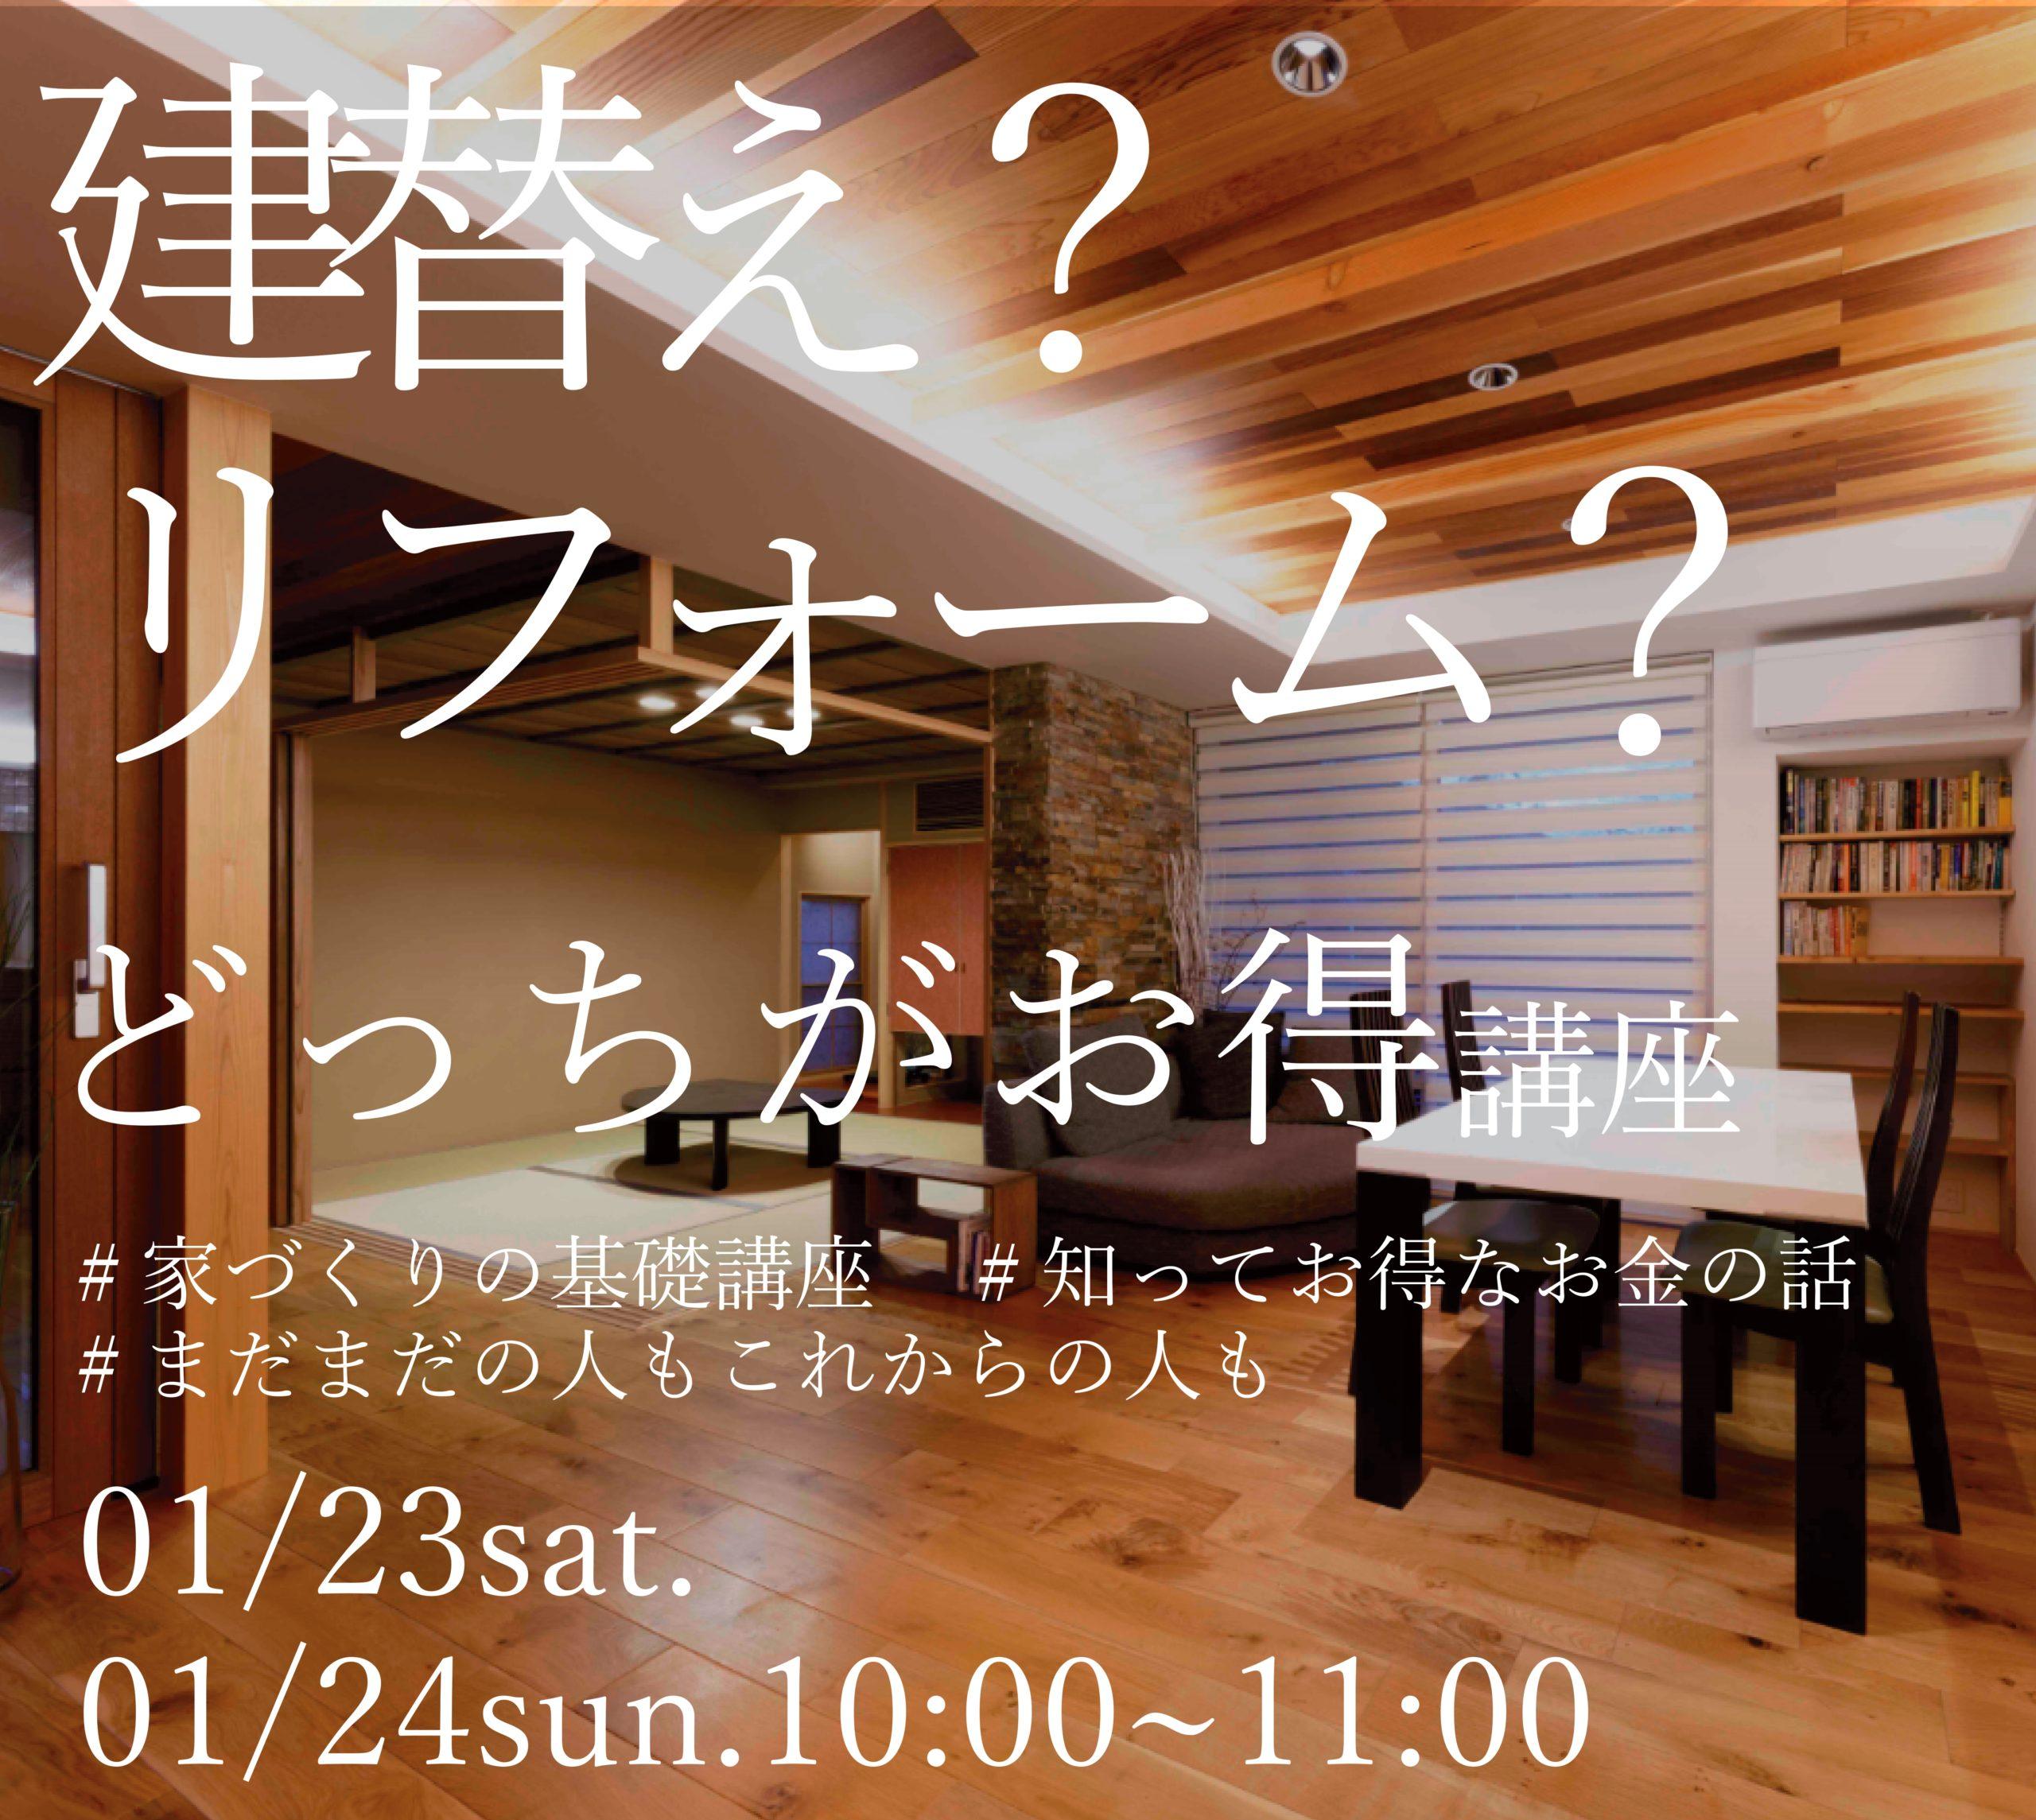 【WEB開催】1月23日(土)・24日(日)10:00~12:00 建替え?リフォーム?どっちがお得?講座